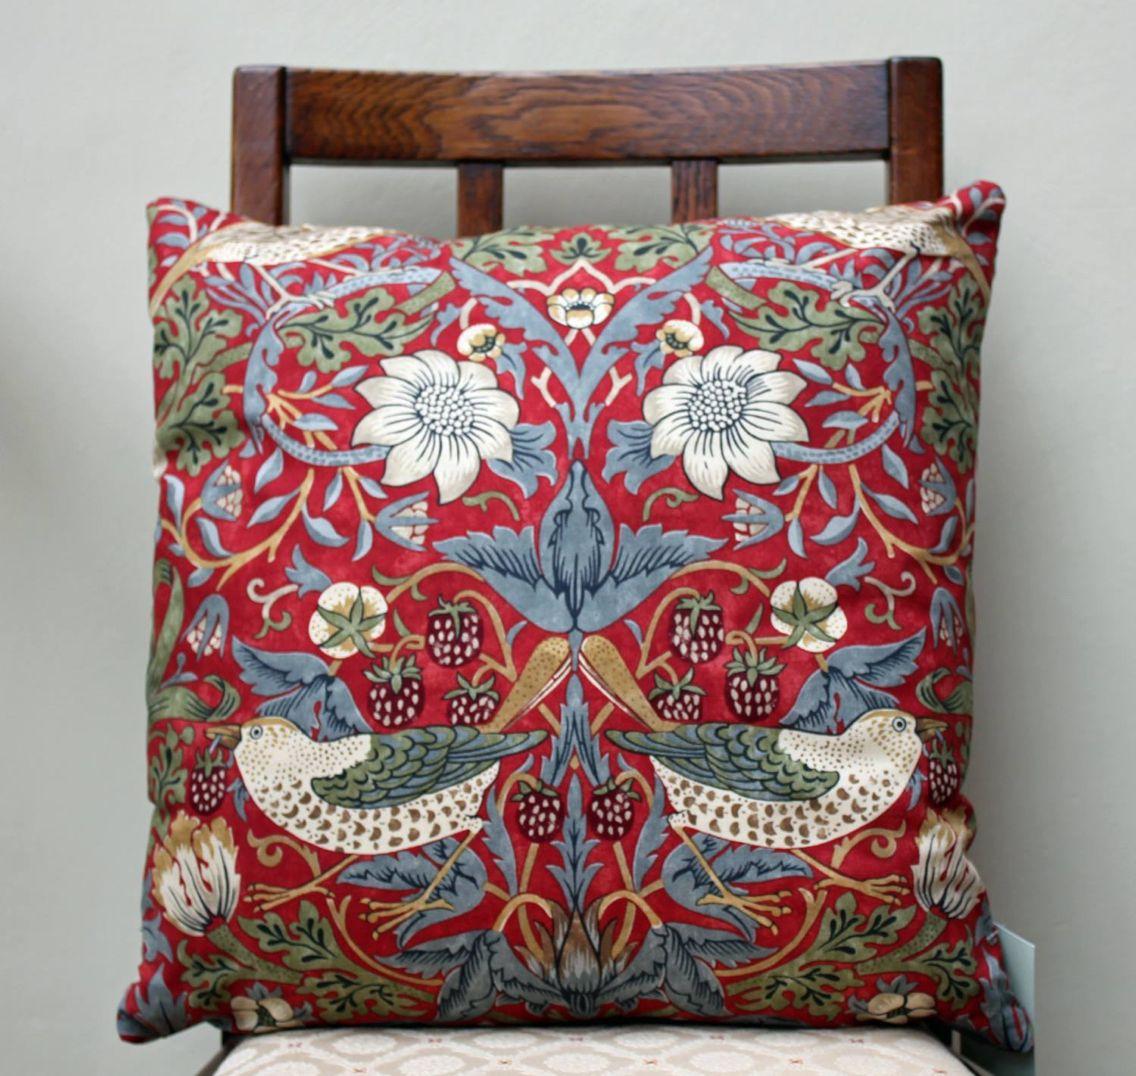 Strawberry thief cushion cover design by william morris decor